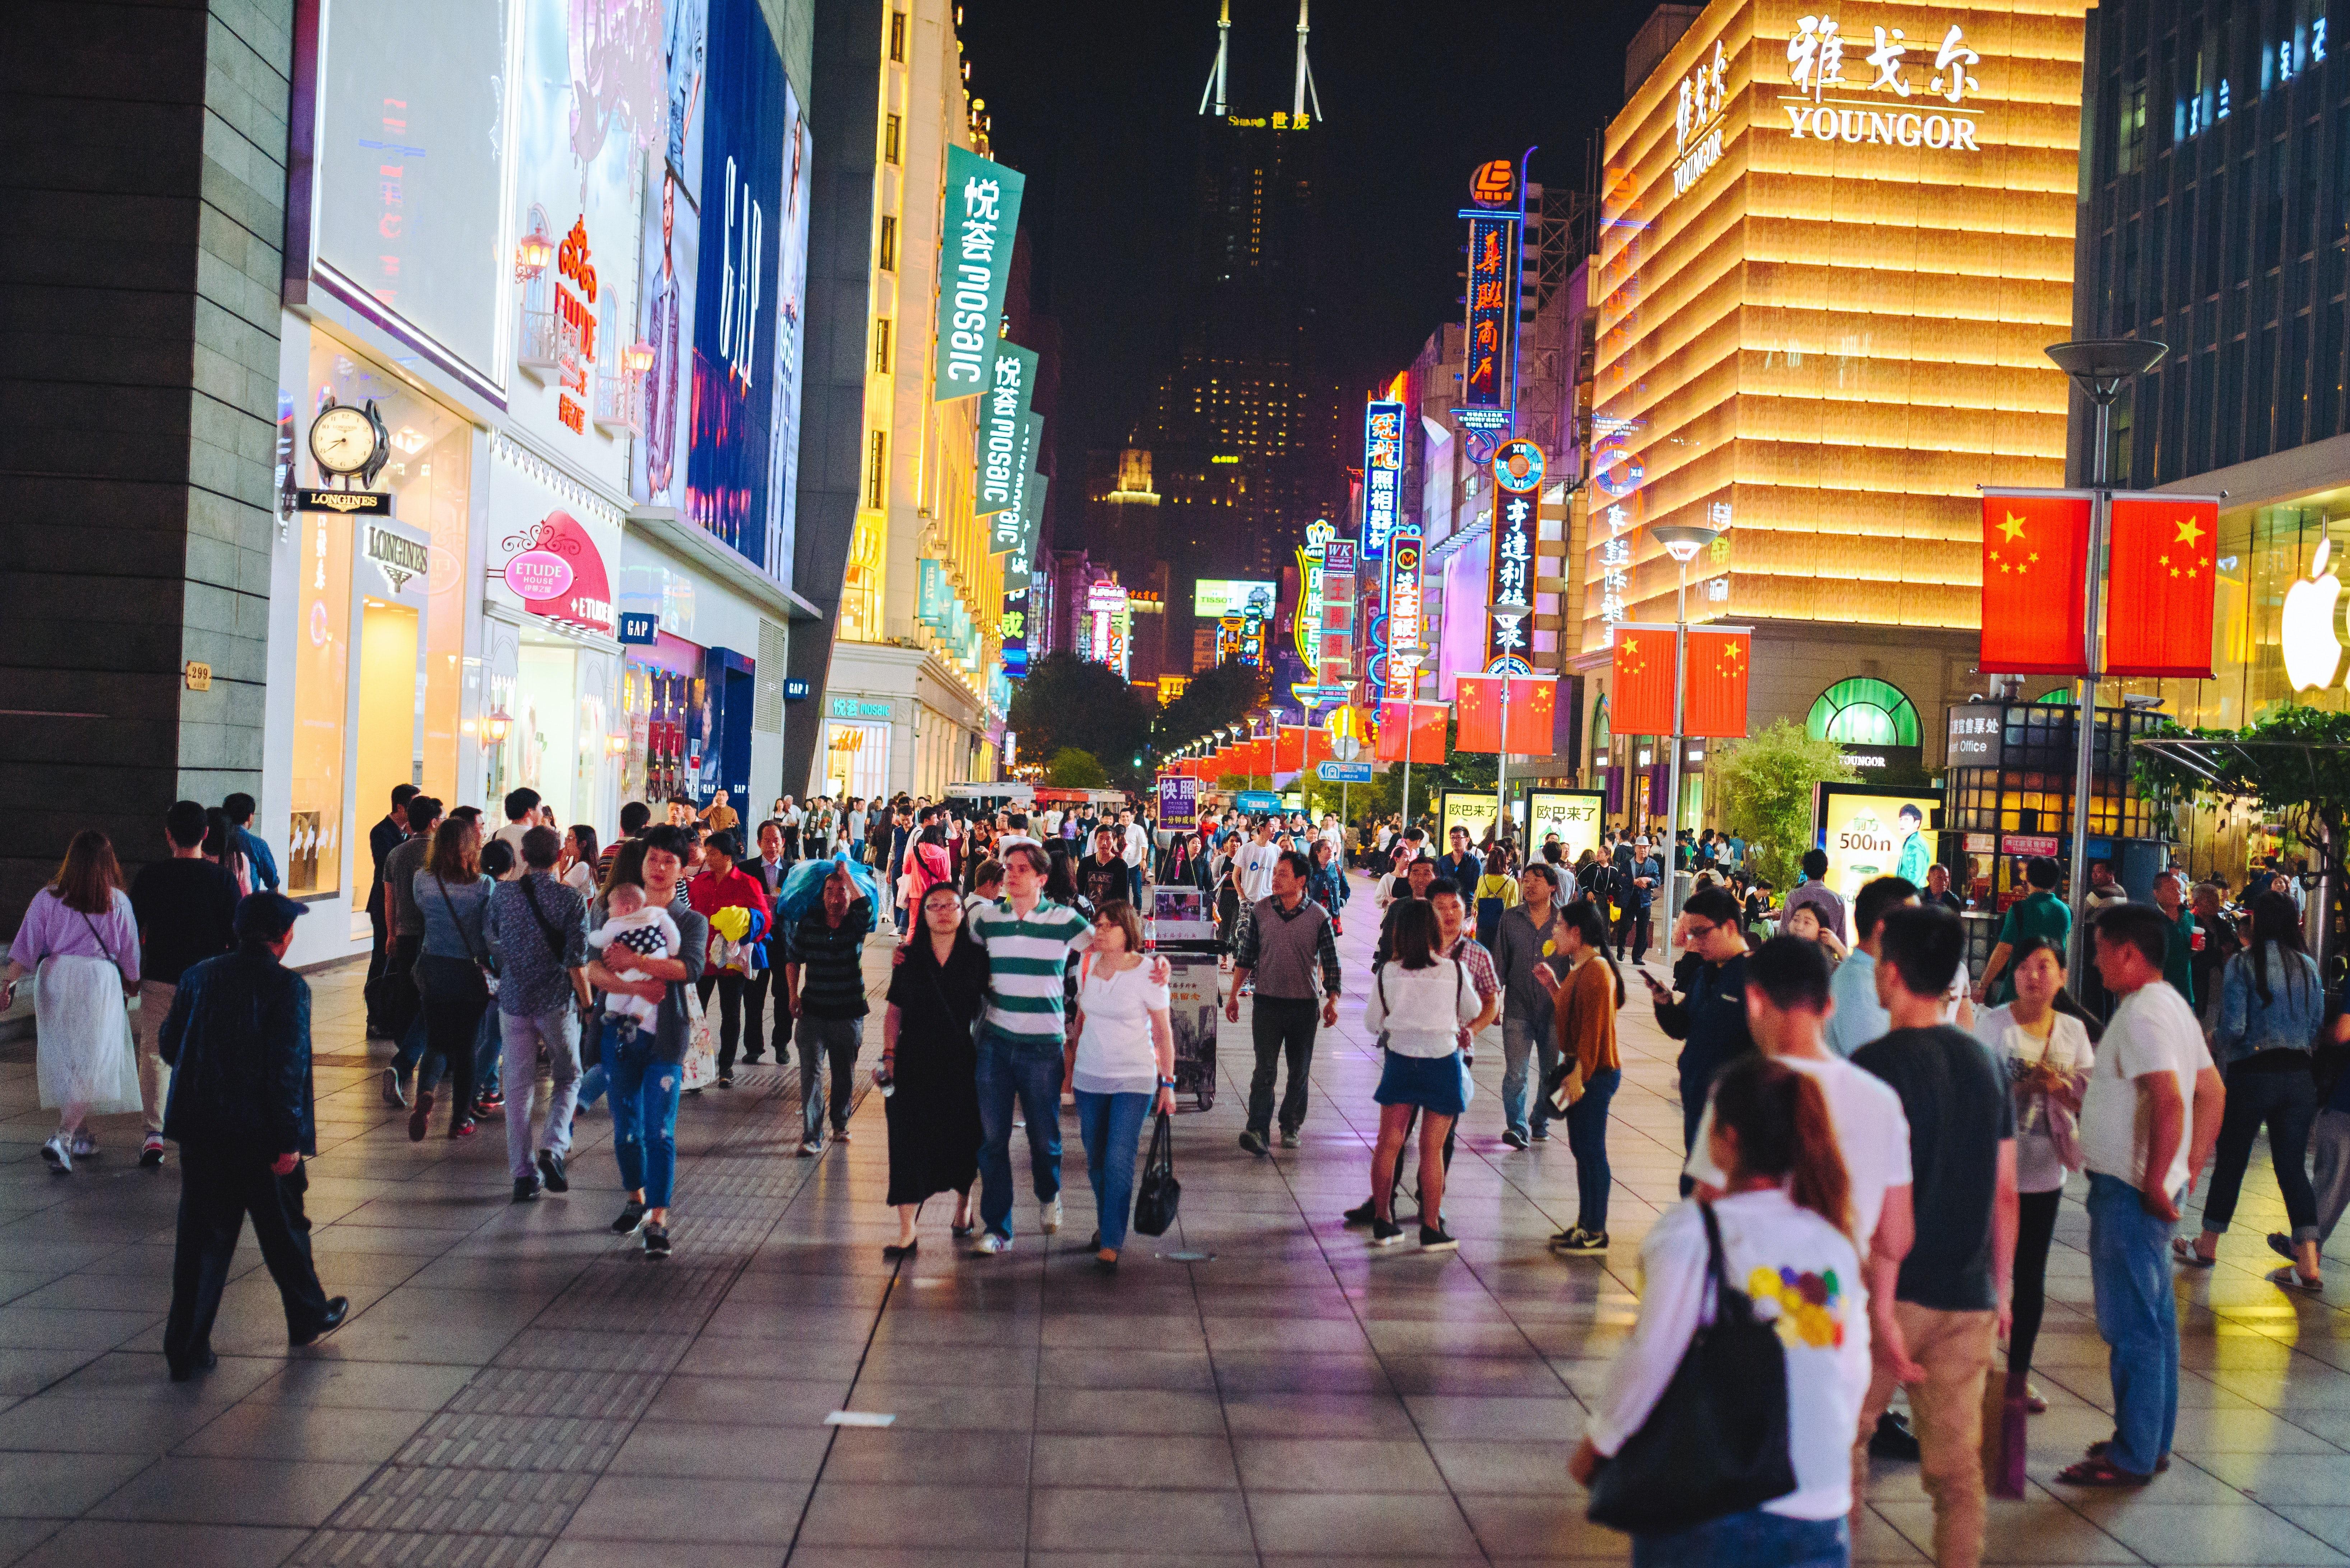 Busy shopping street in Shanghai, China. Shutterstock.